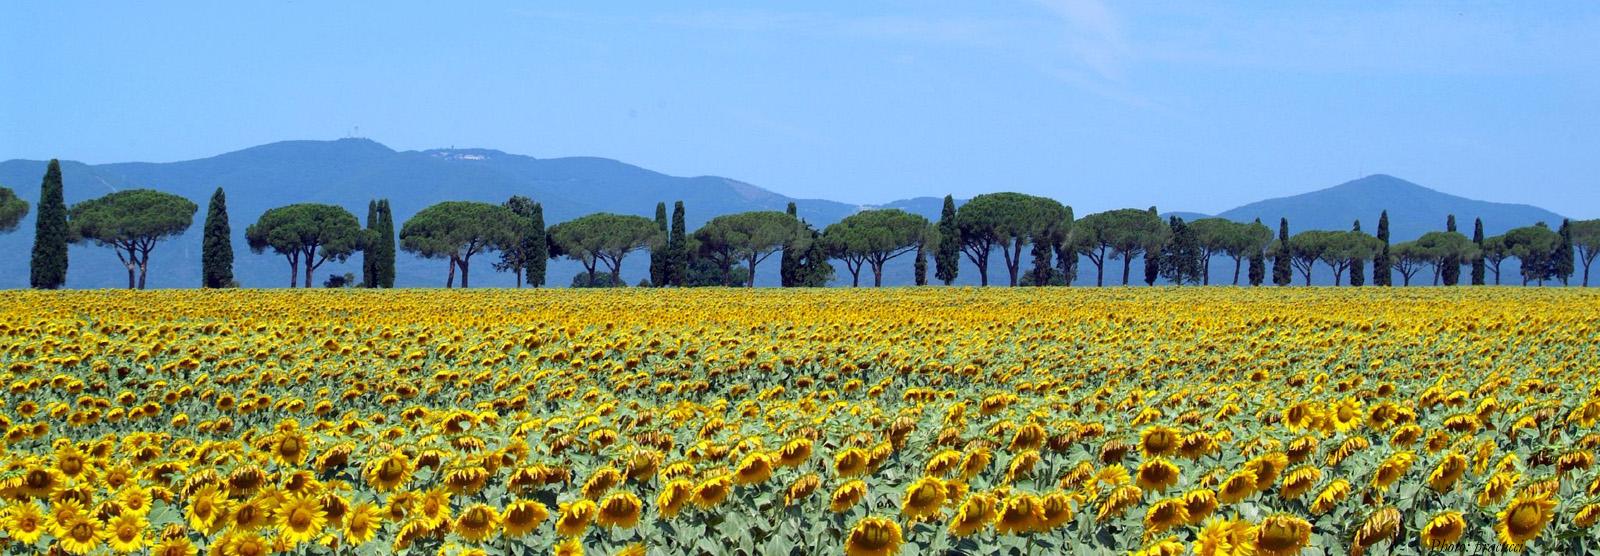 Maremma-landscape